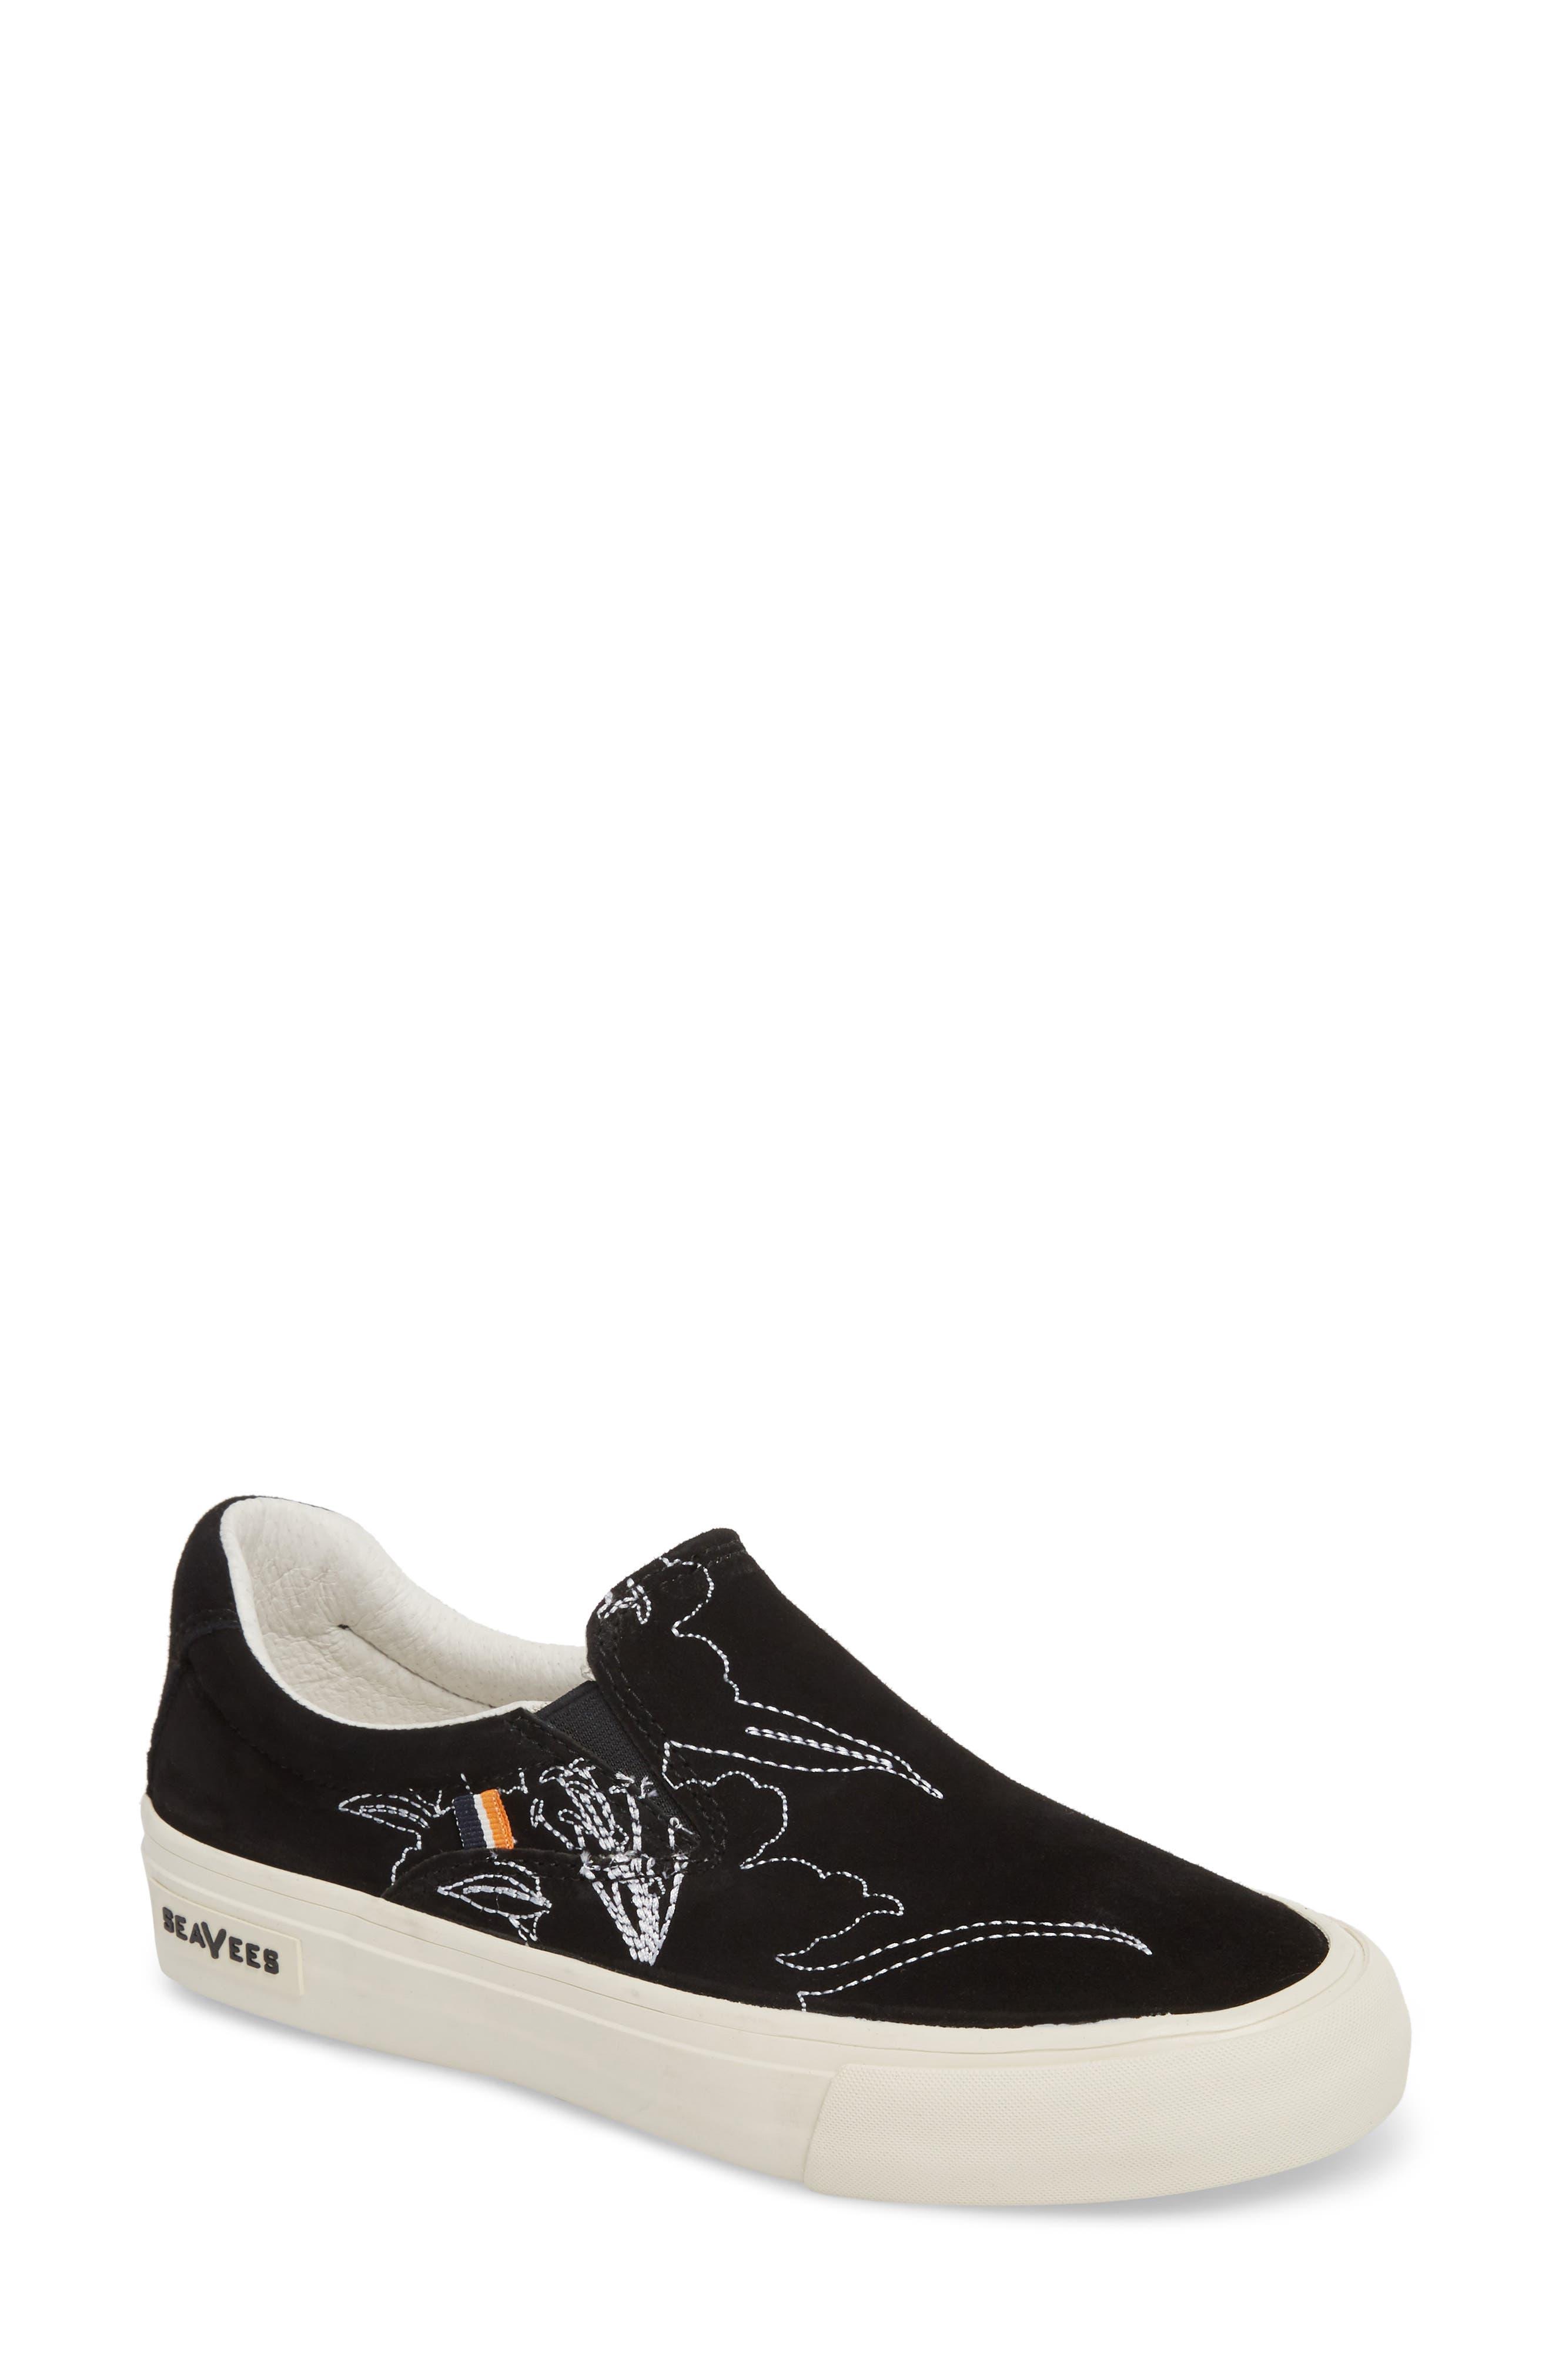 x Derek Lam 10 Crosby Hawthorne Embroidered Slip-On,                             Main thumbnail 1, color,                             001